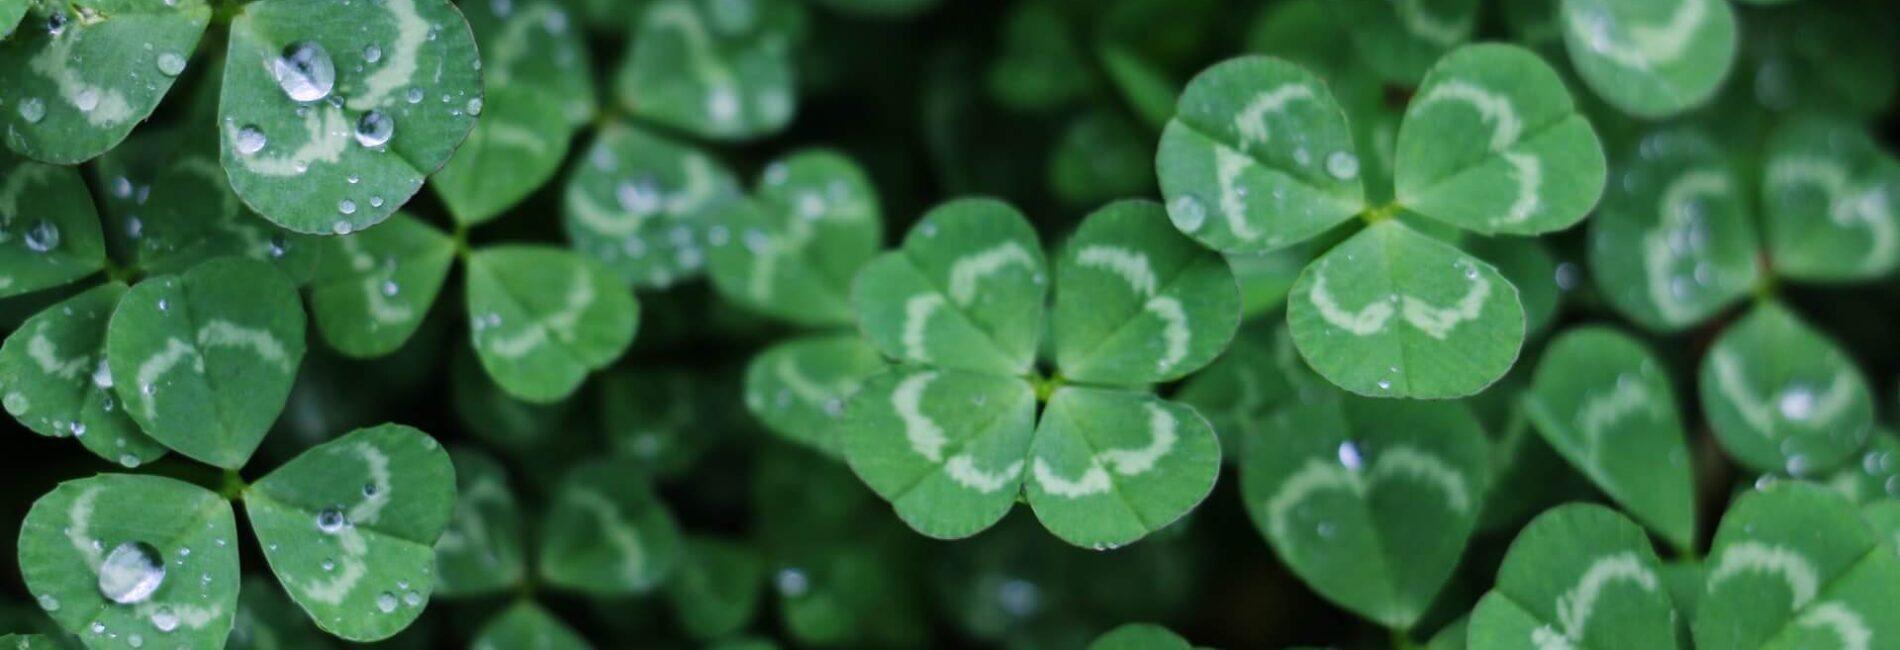 Celebrate St. Patrick's Day with a Green Irish Breakfast